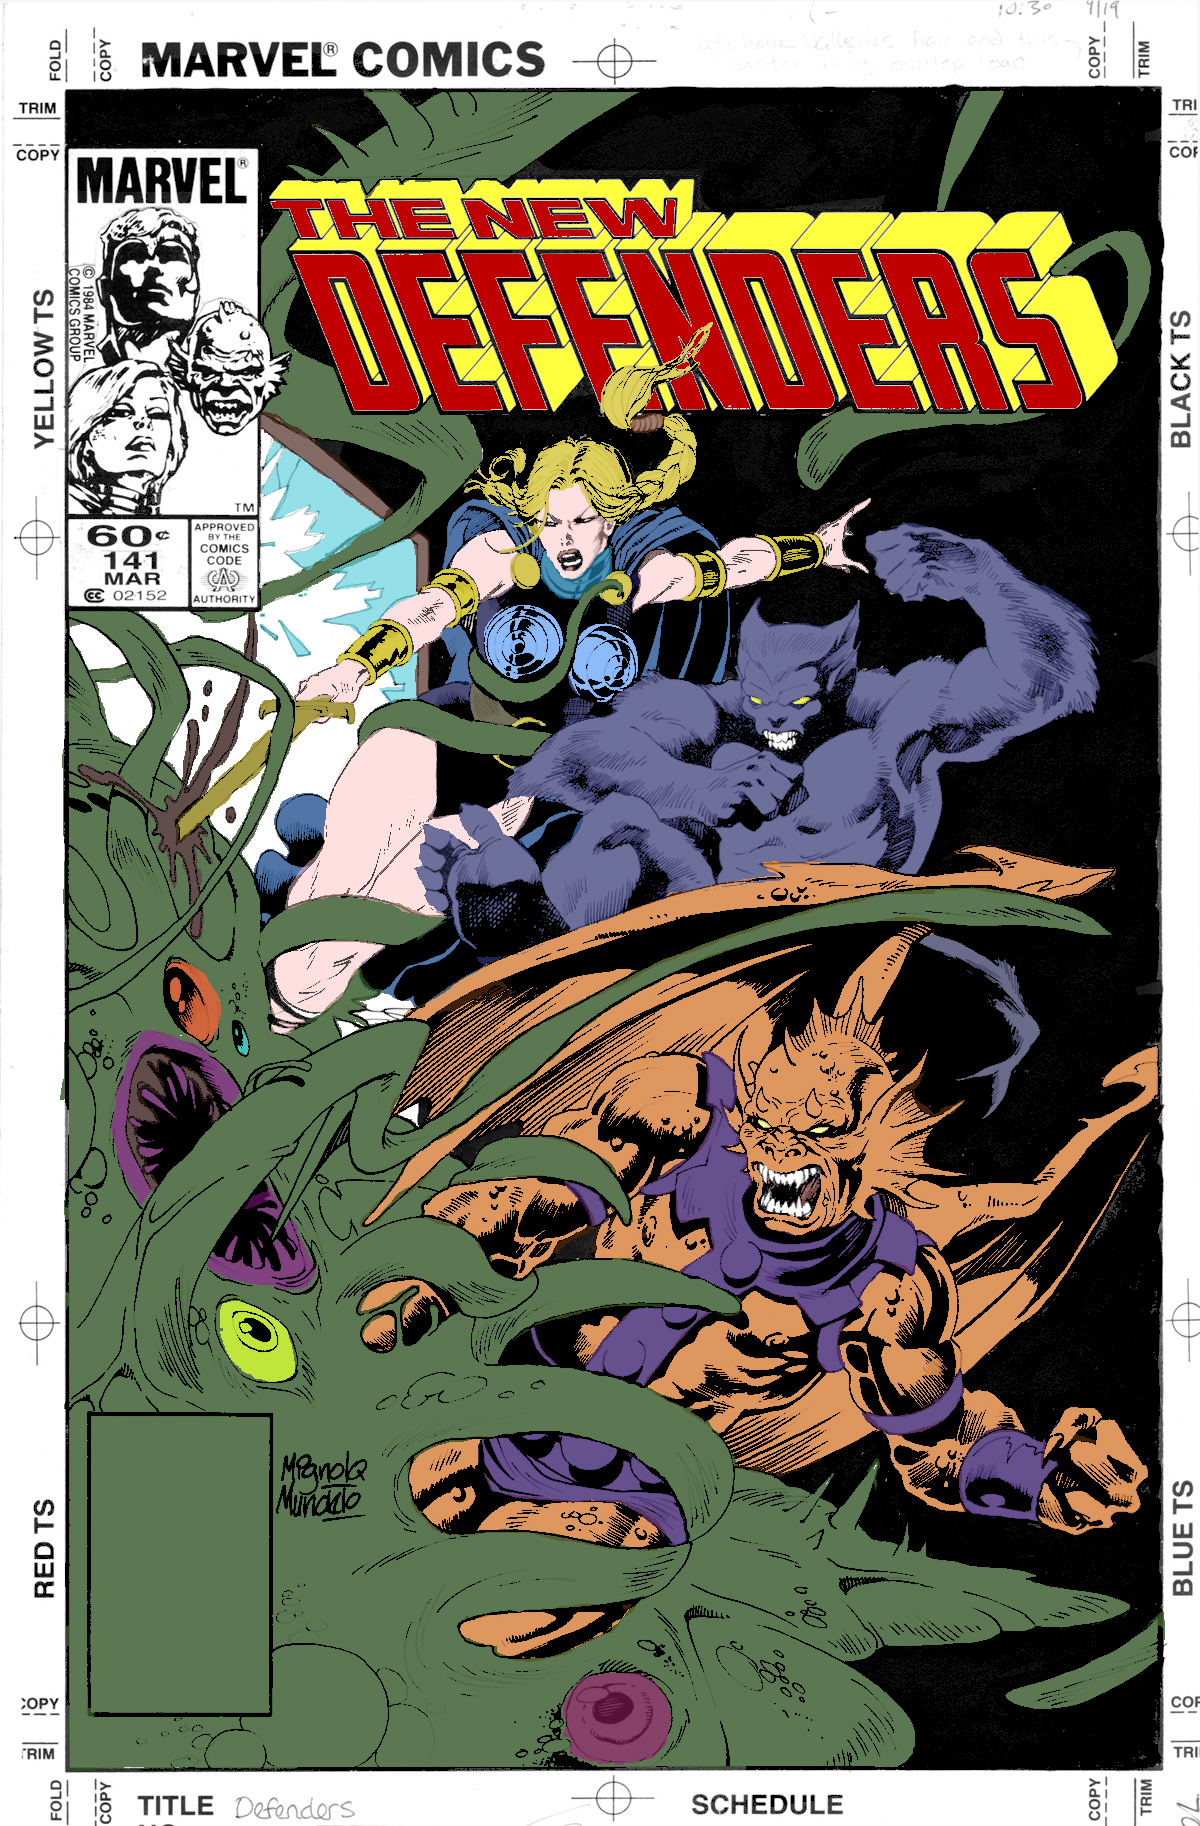 3 - Digitally coloring B&W Images. Defenders141